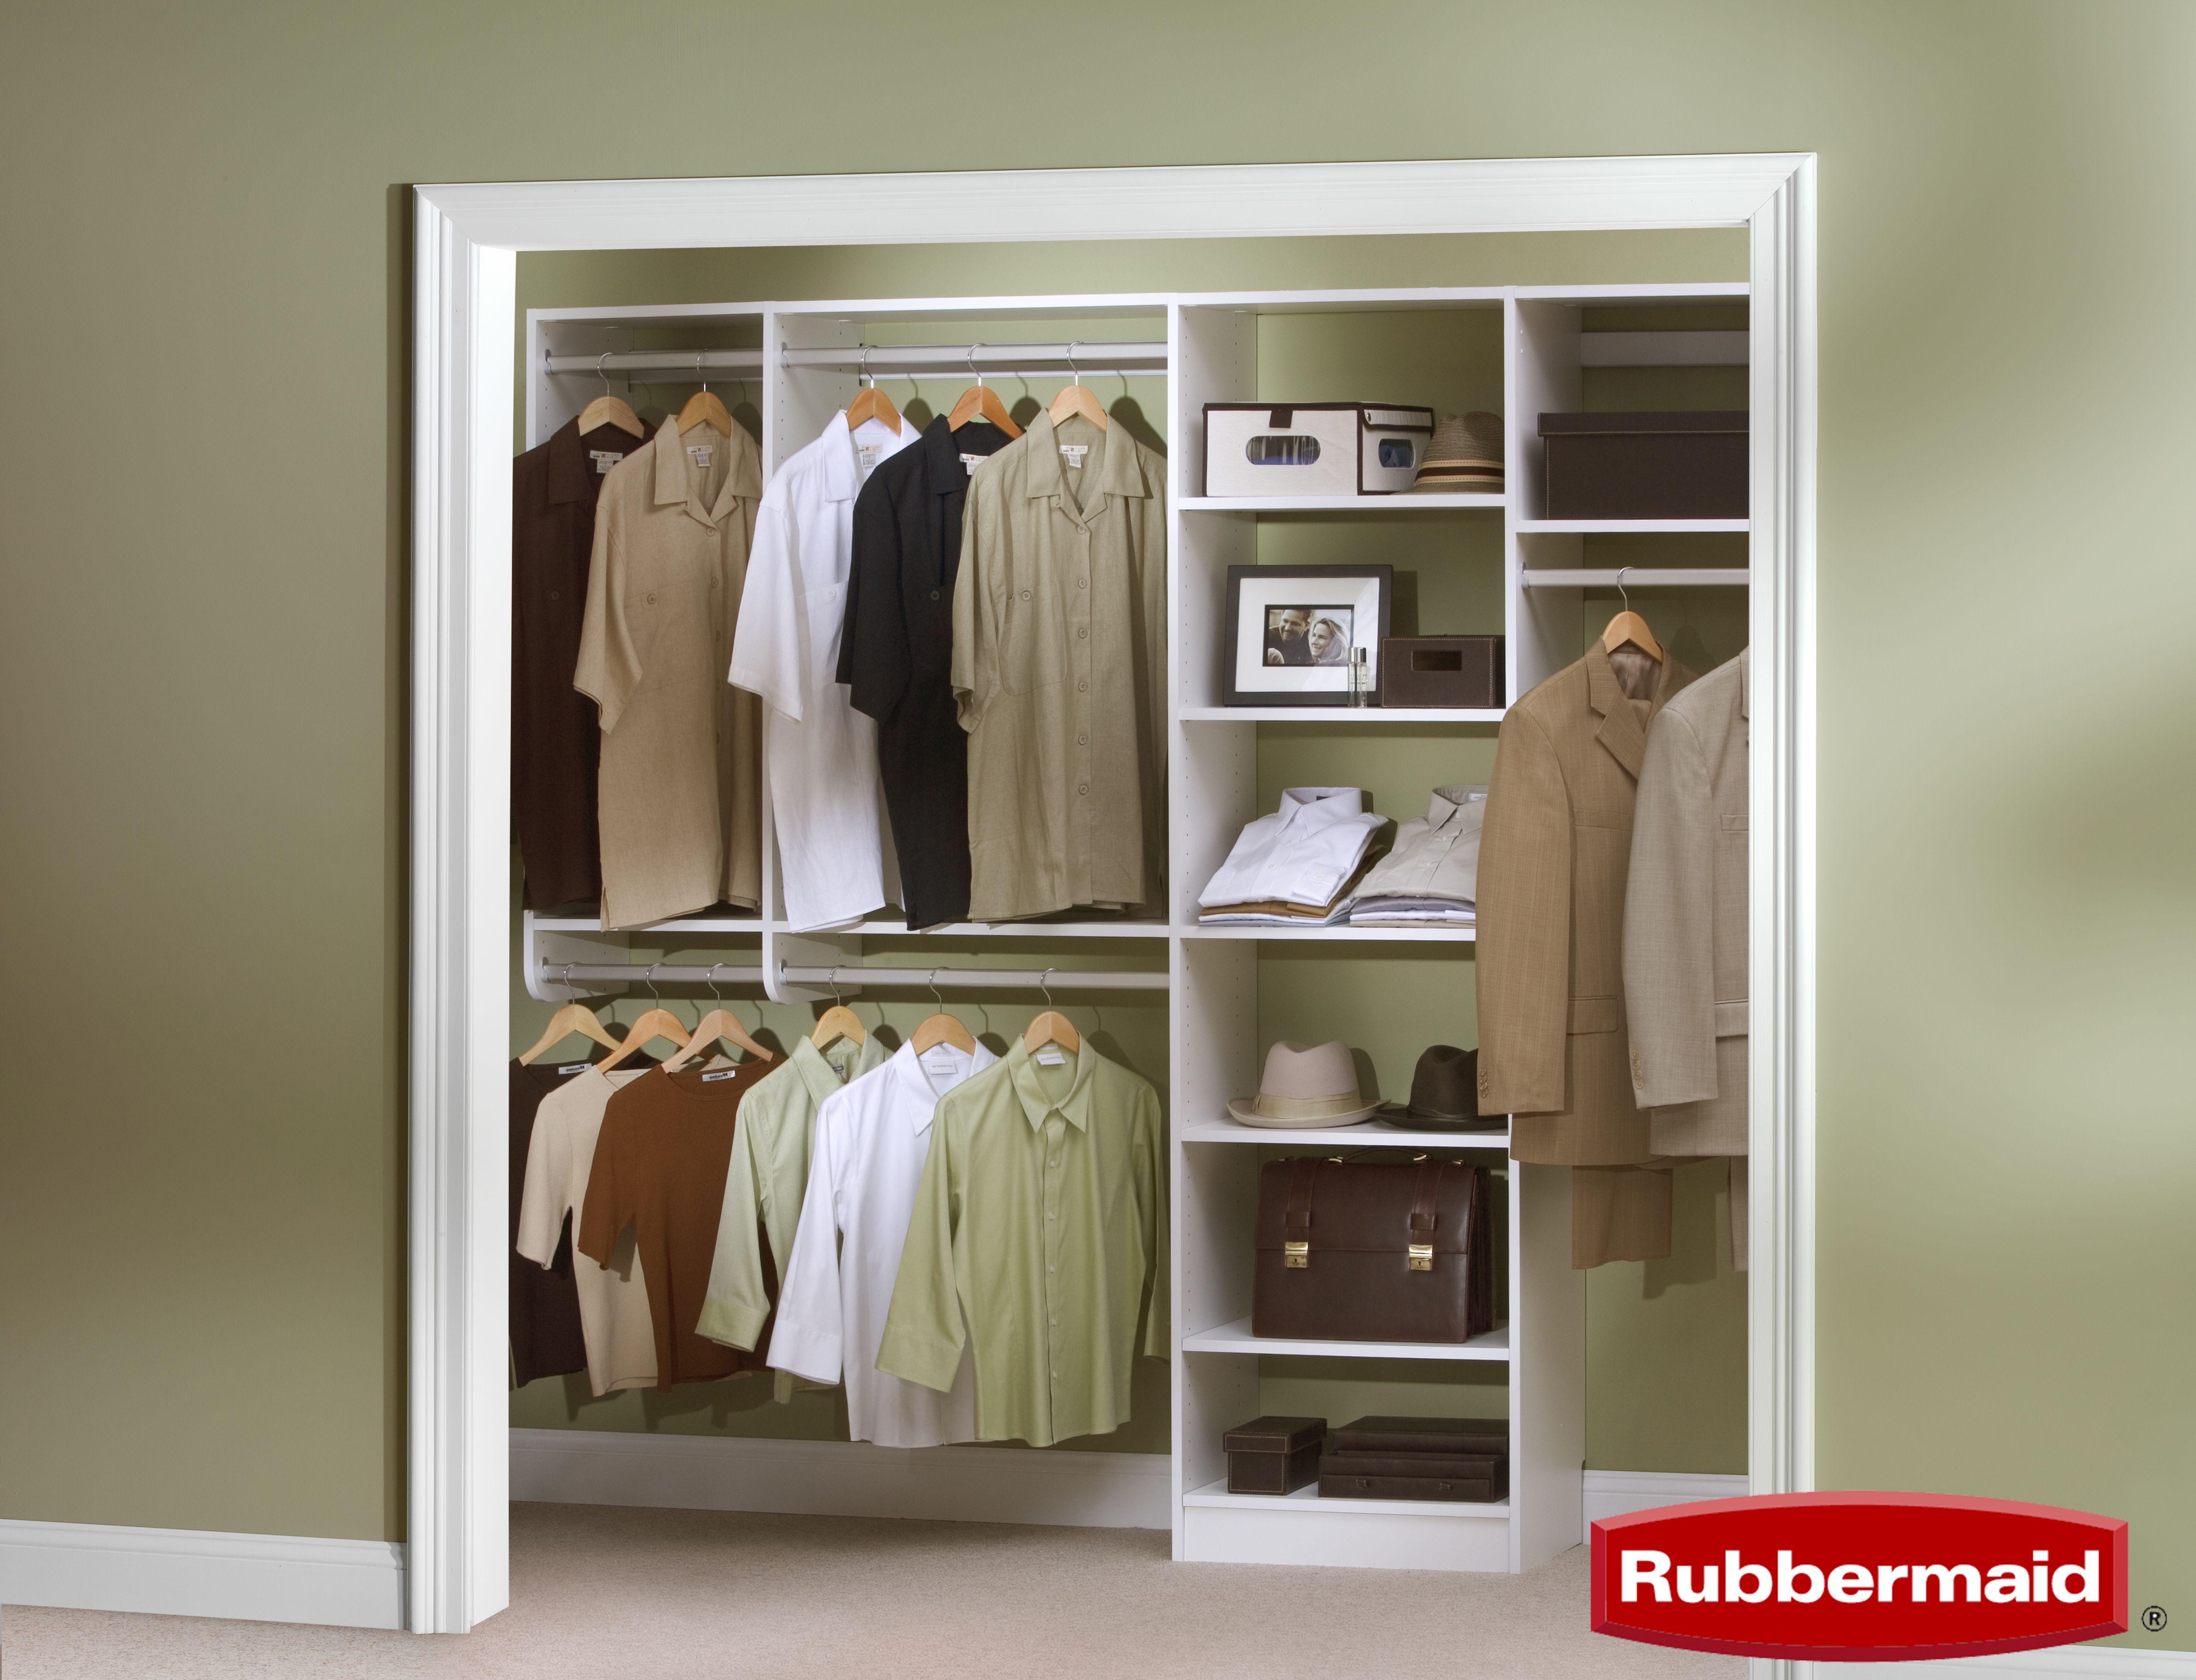 Rubbermaid Closet Configuration Pictures   Bing Images